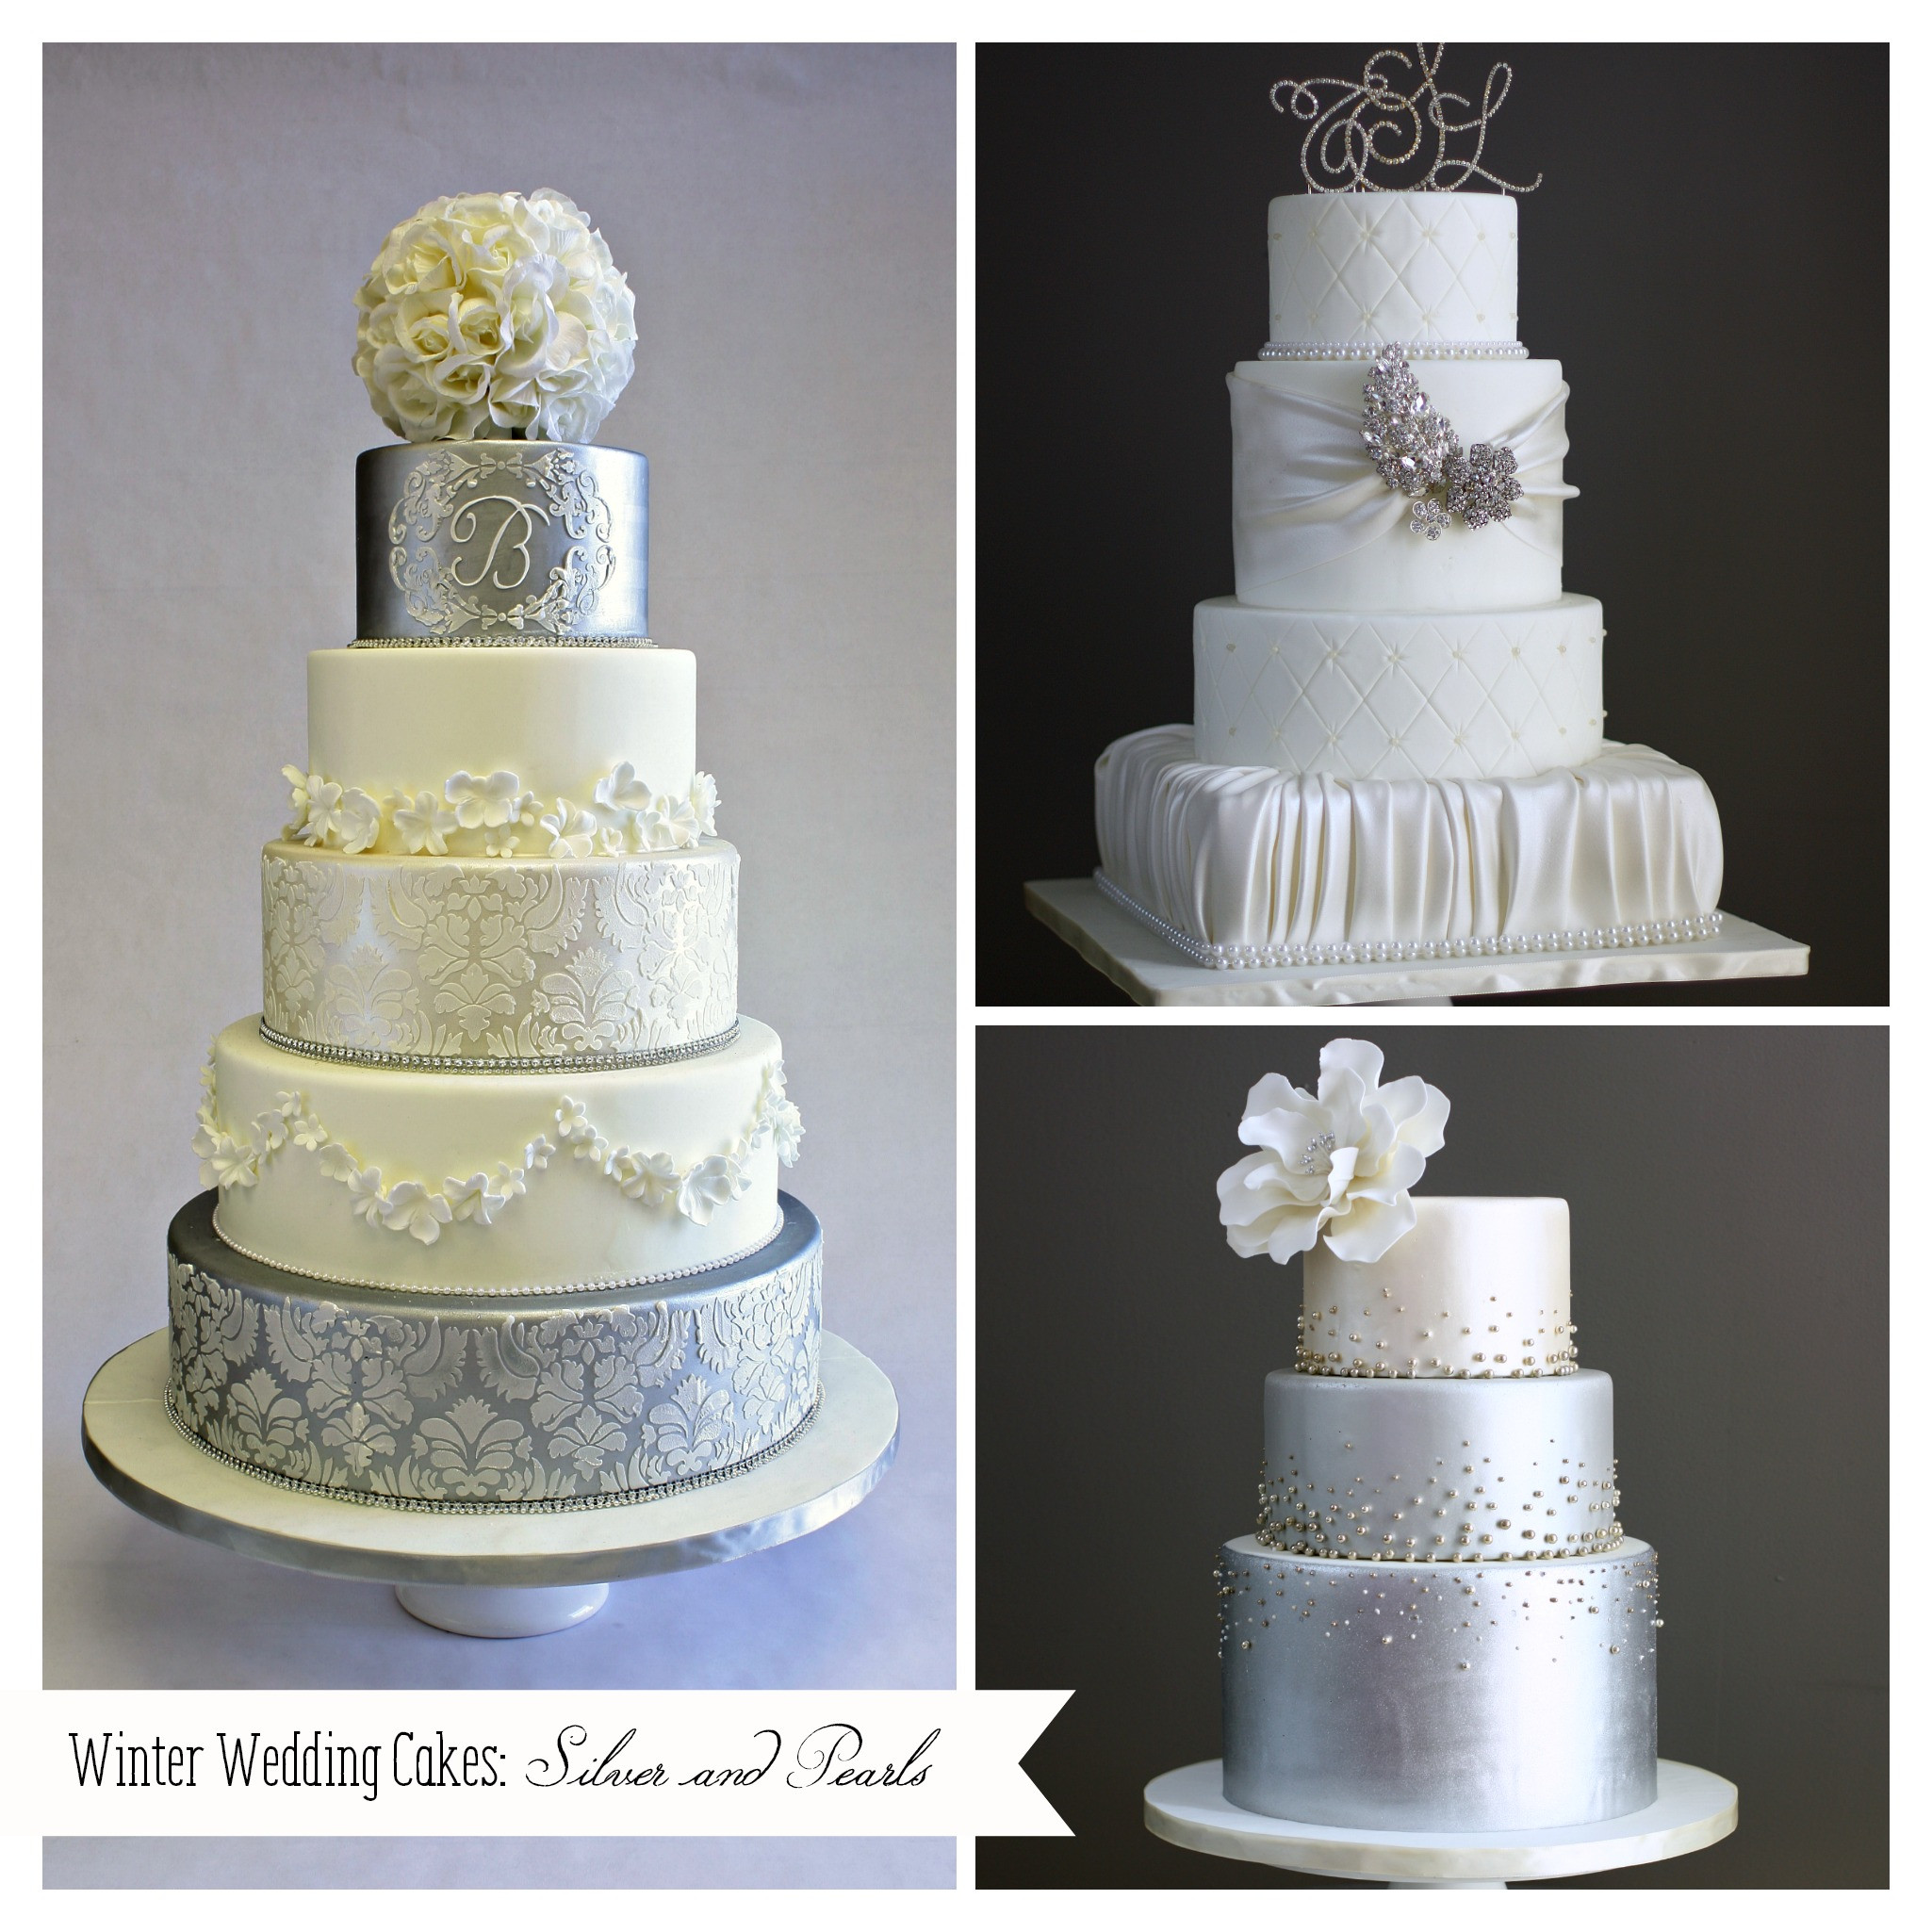 I Do Wedding Cakes  Winter Weddings Mean Less Stress and Big Savings I Do